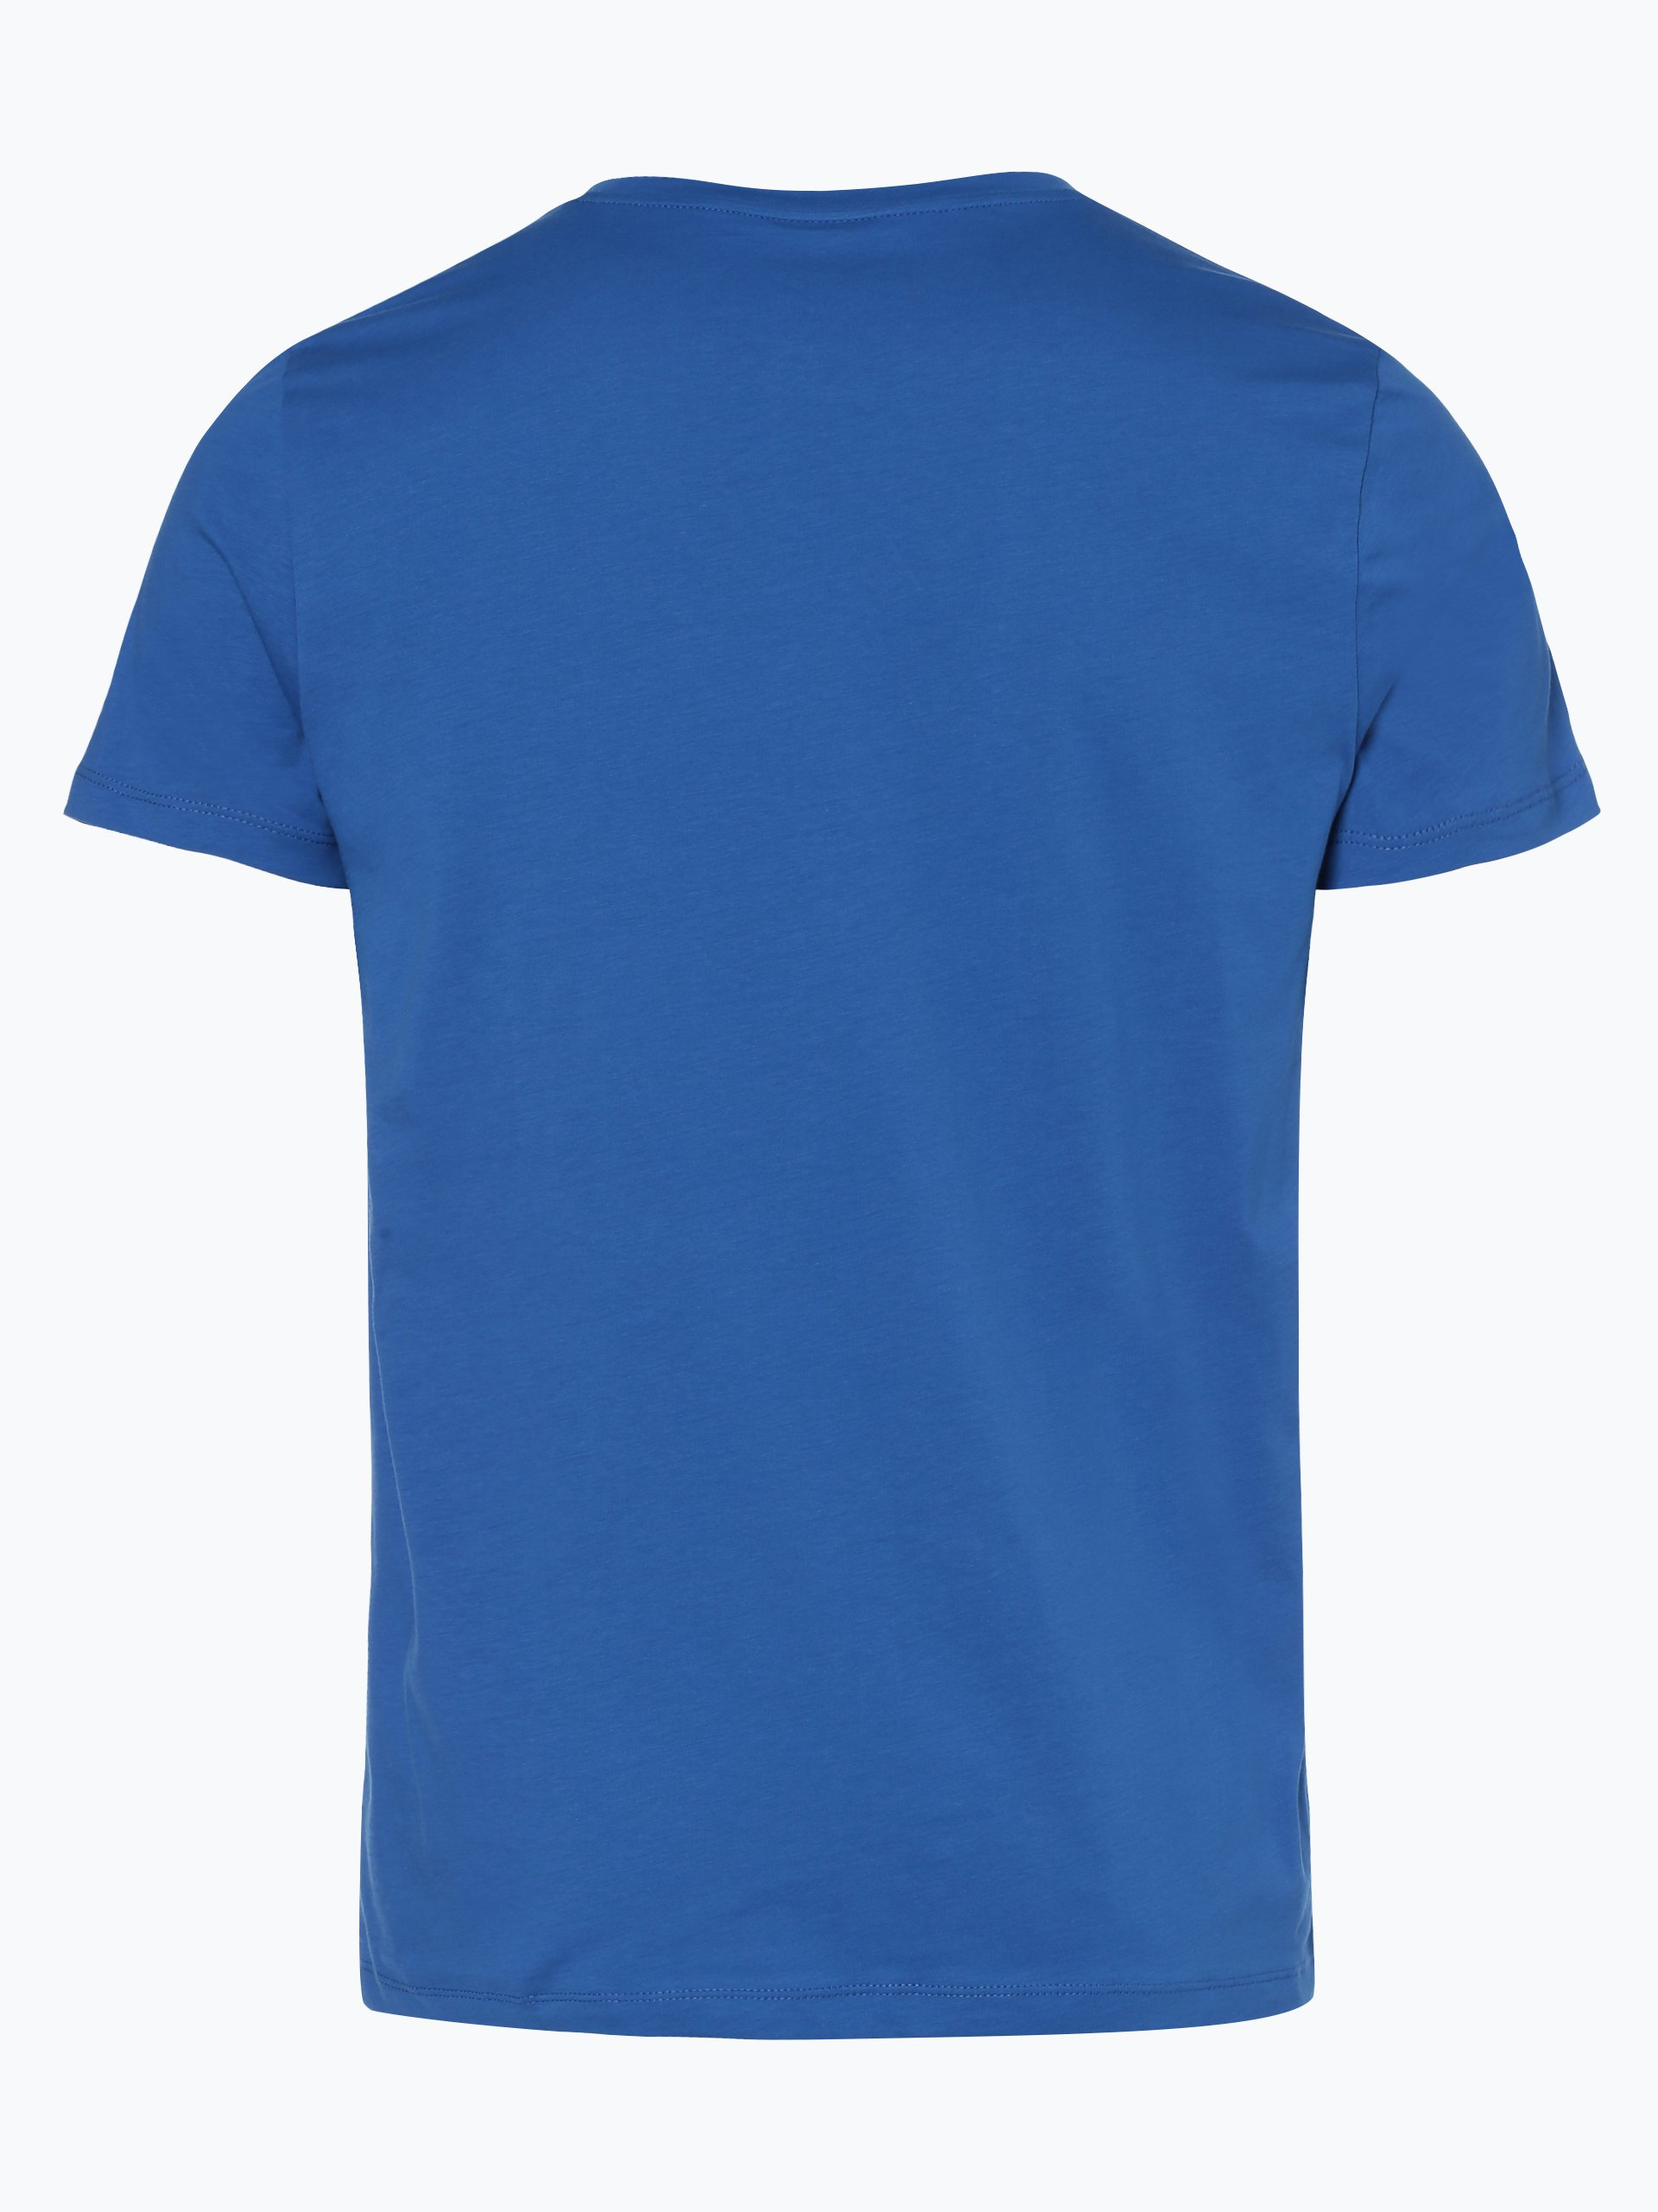 BOSS Casual T-shirt męski – Topwork 1